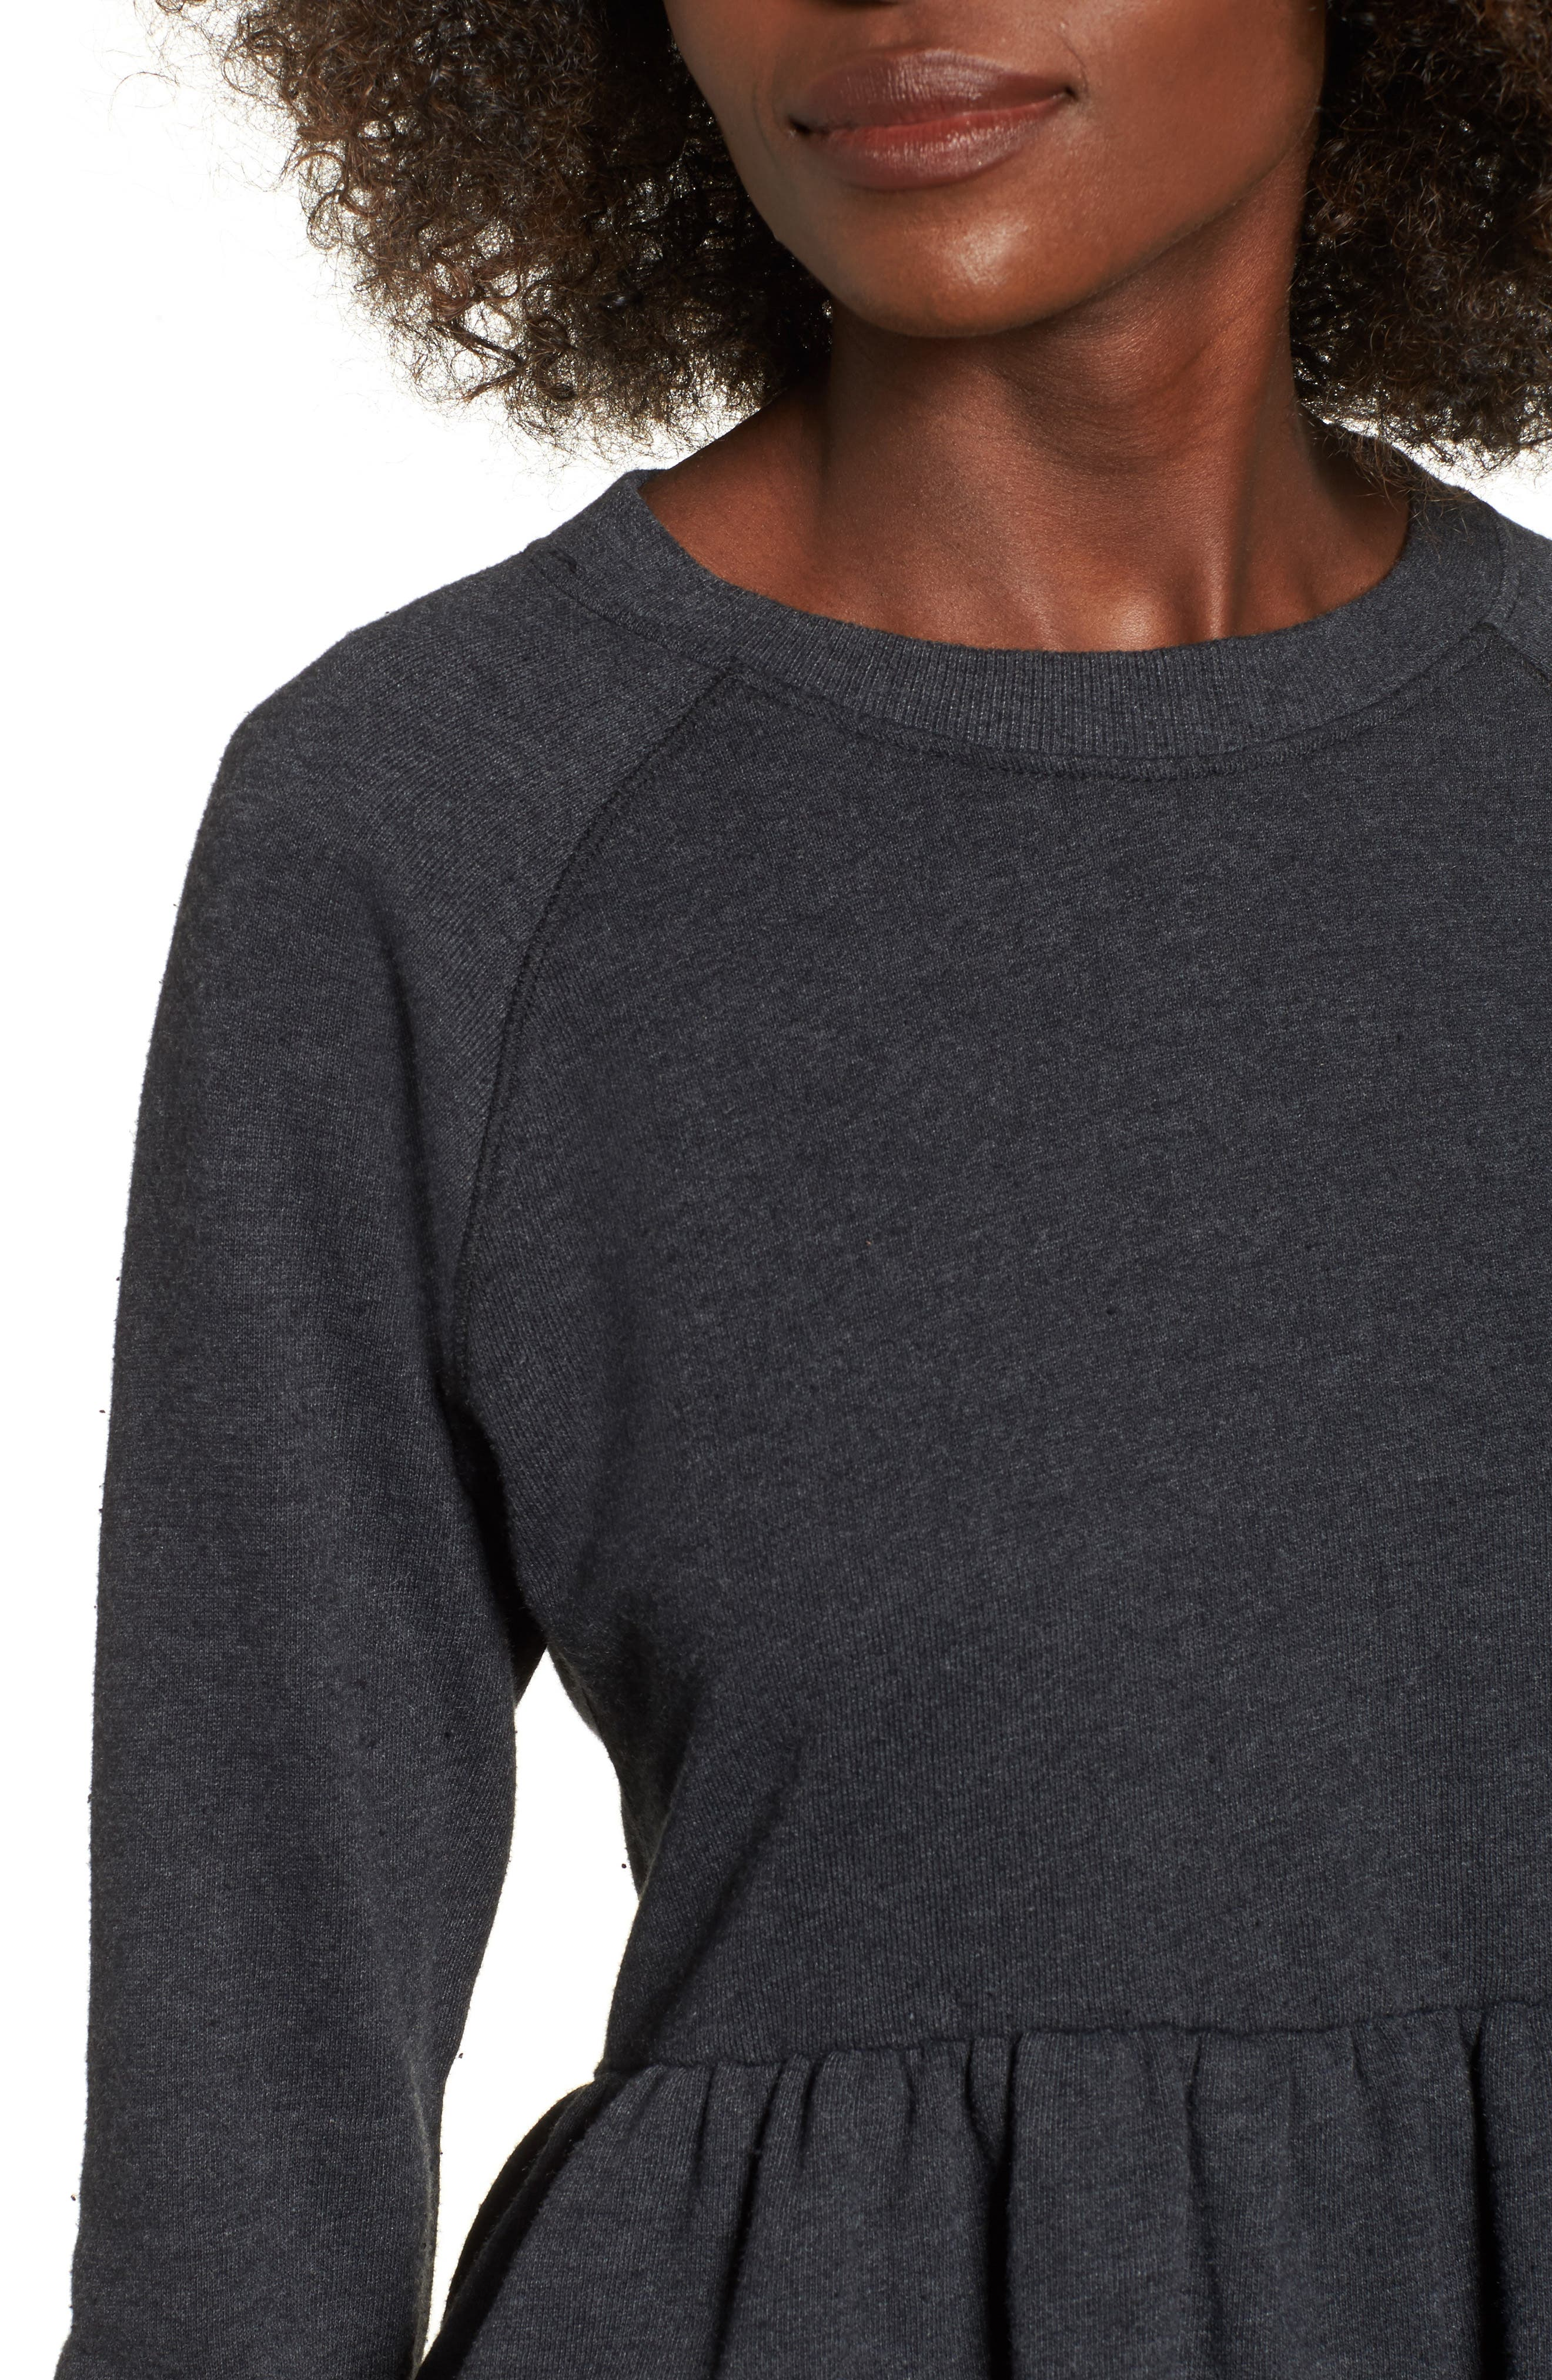 Viera Fleece Peplum Sweatshirt,                             Alternate thumbnail 4, color,                             020